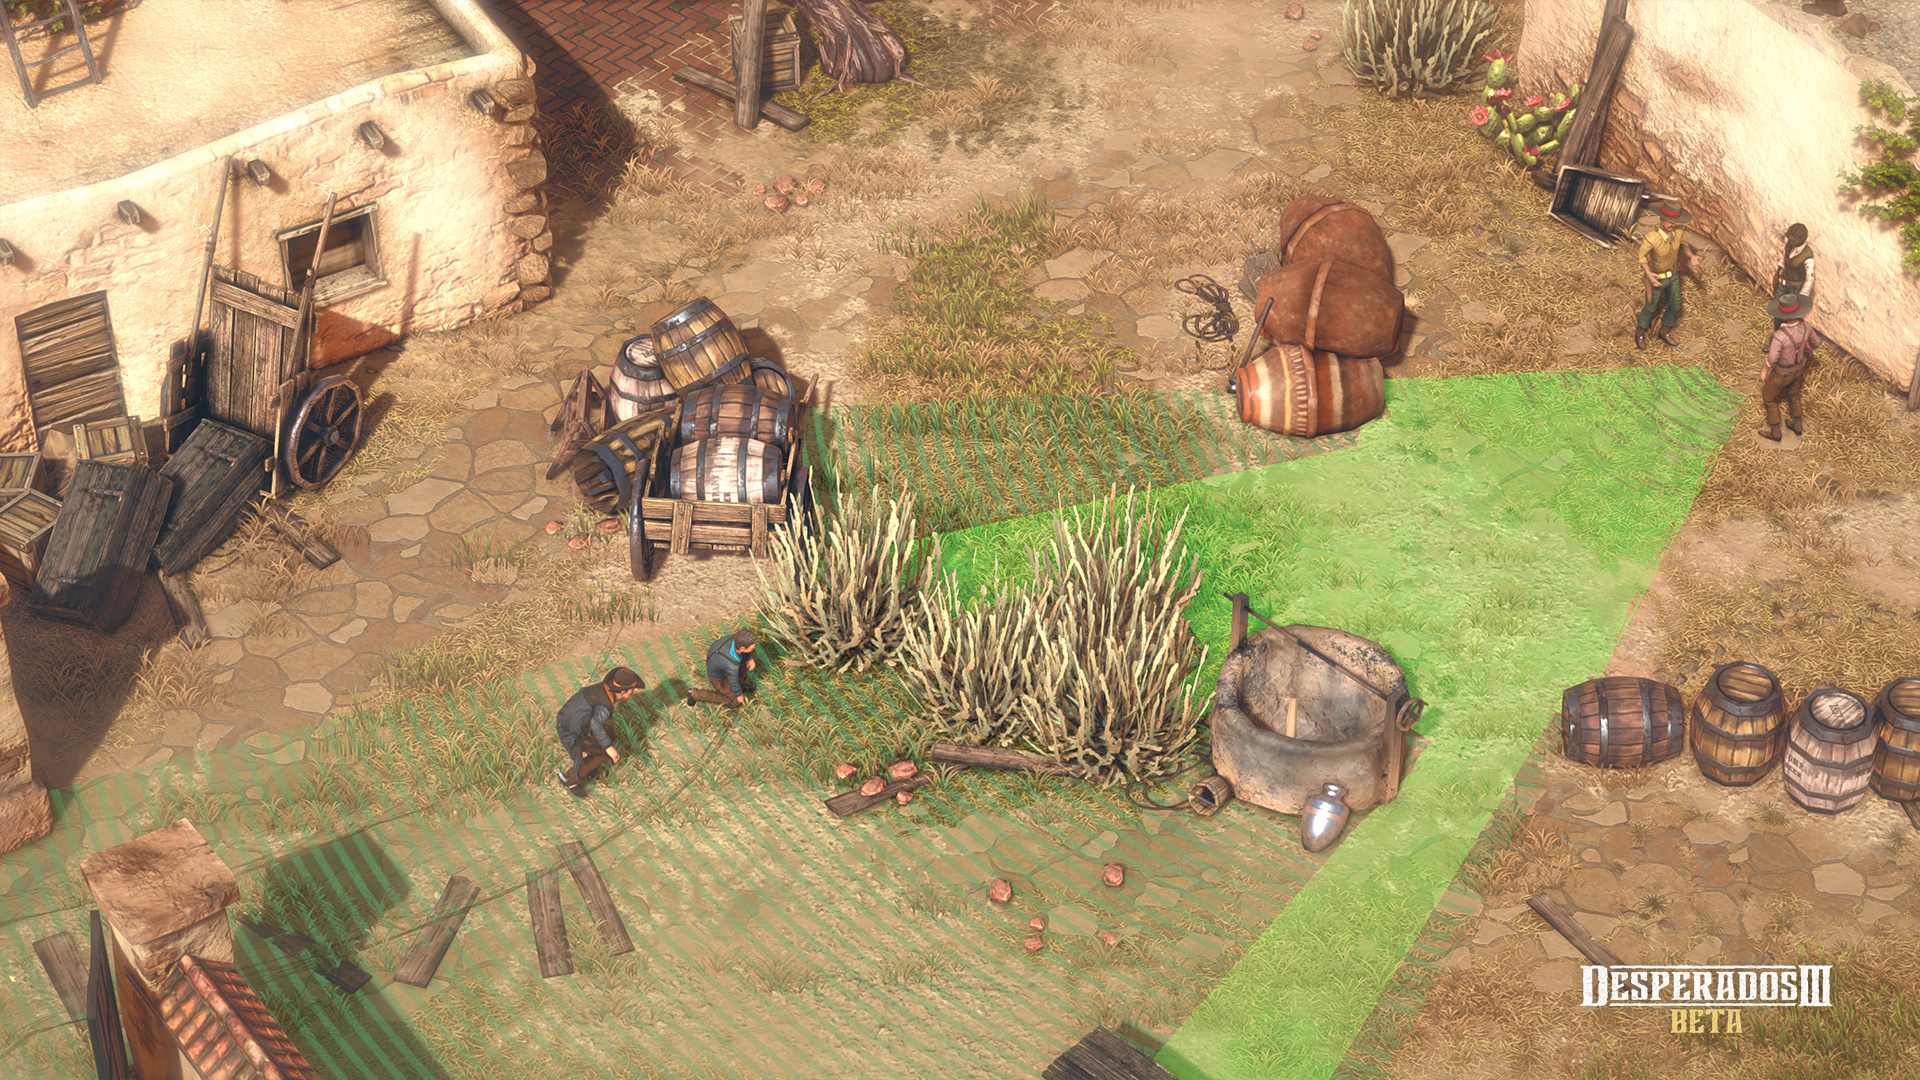 Desperados Iii Ps4 Playstation 4 Game Profile News Reviews Videos Screenshots